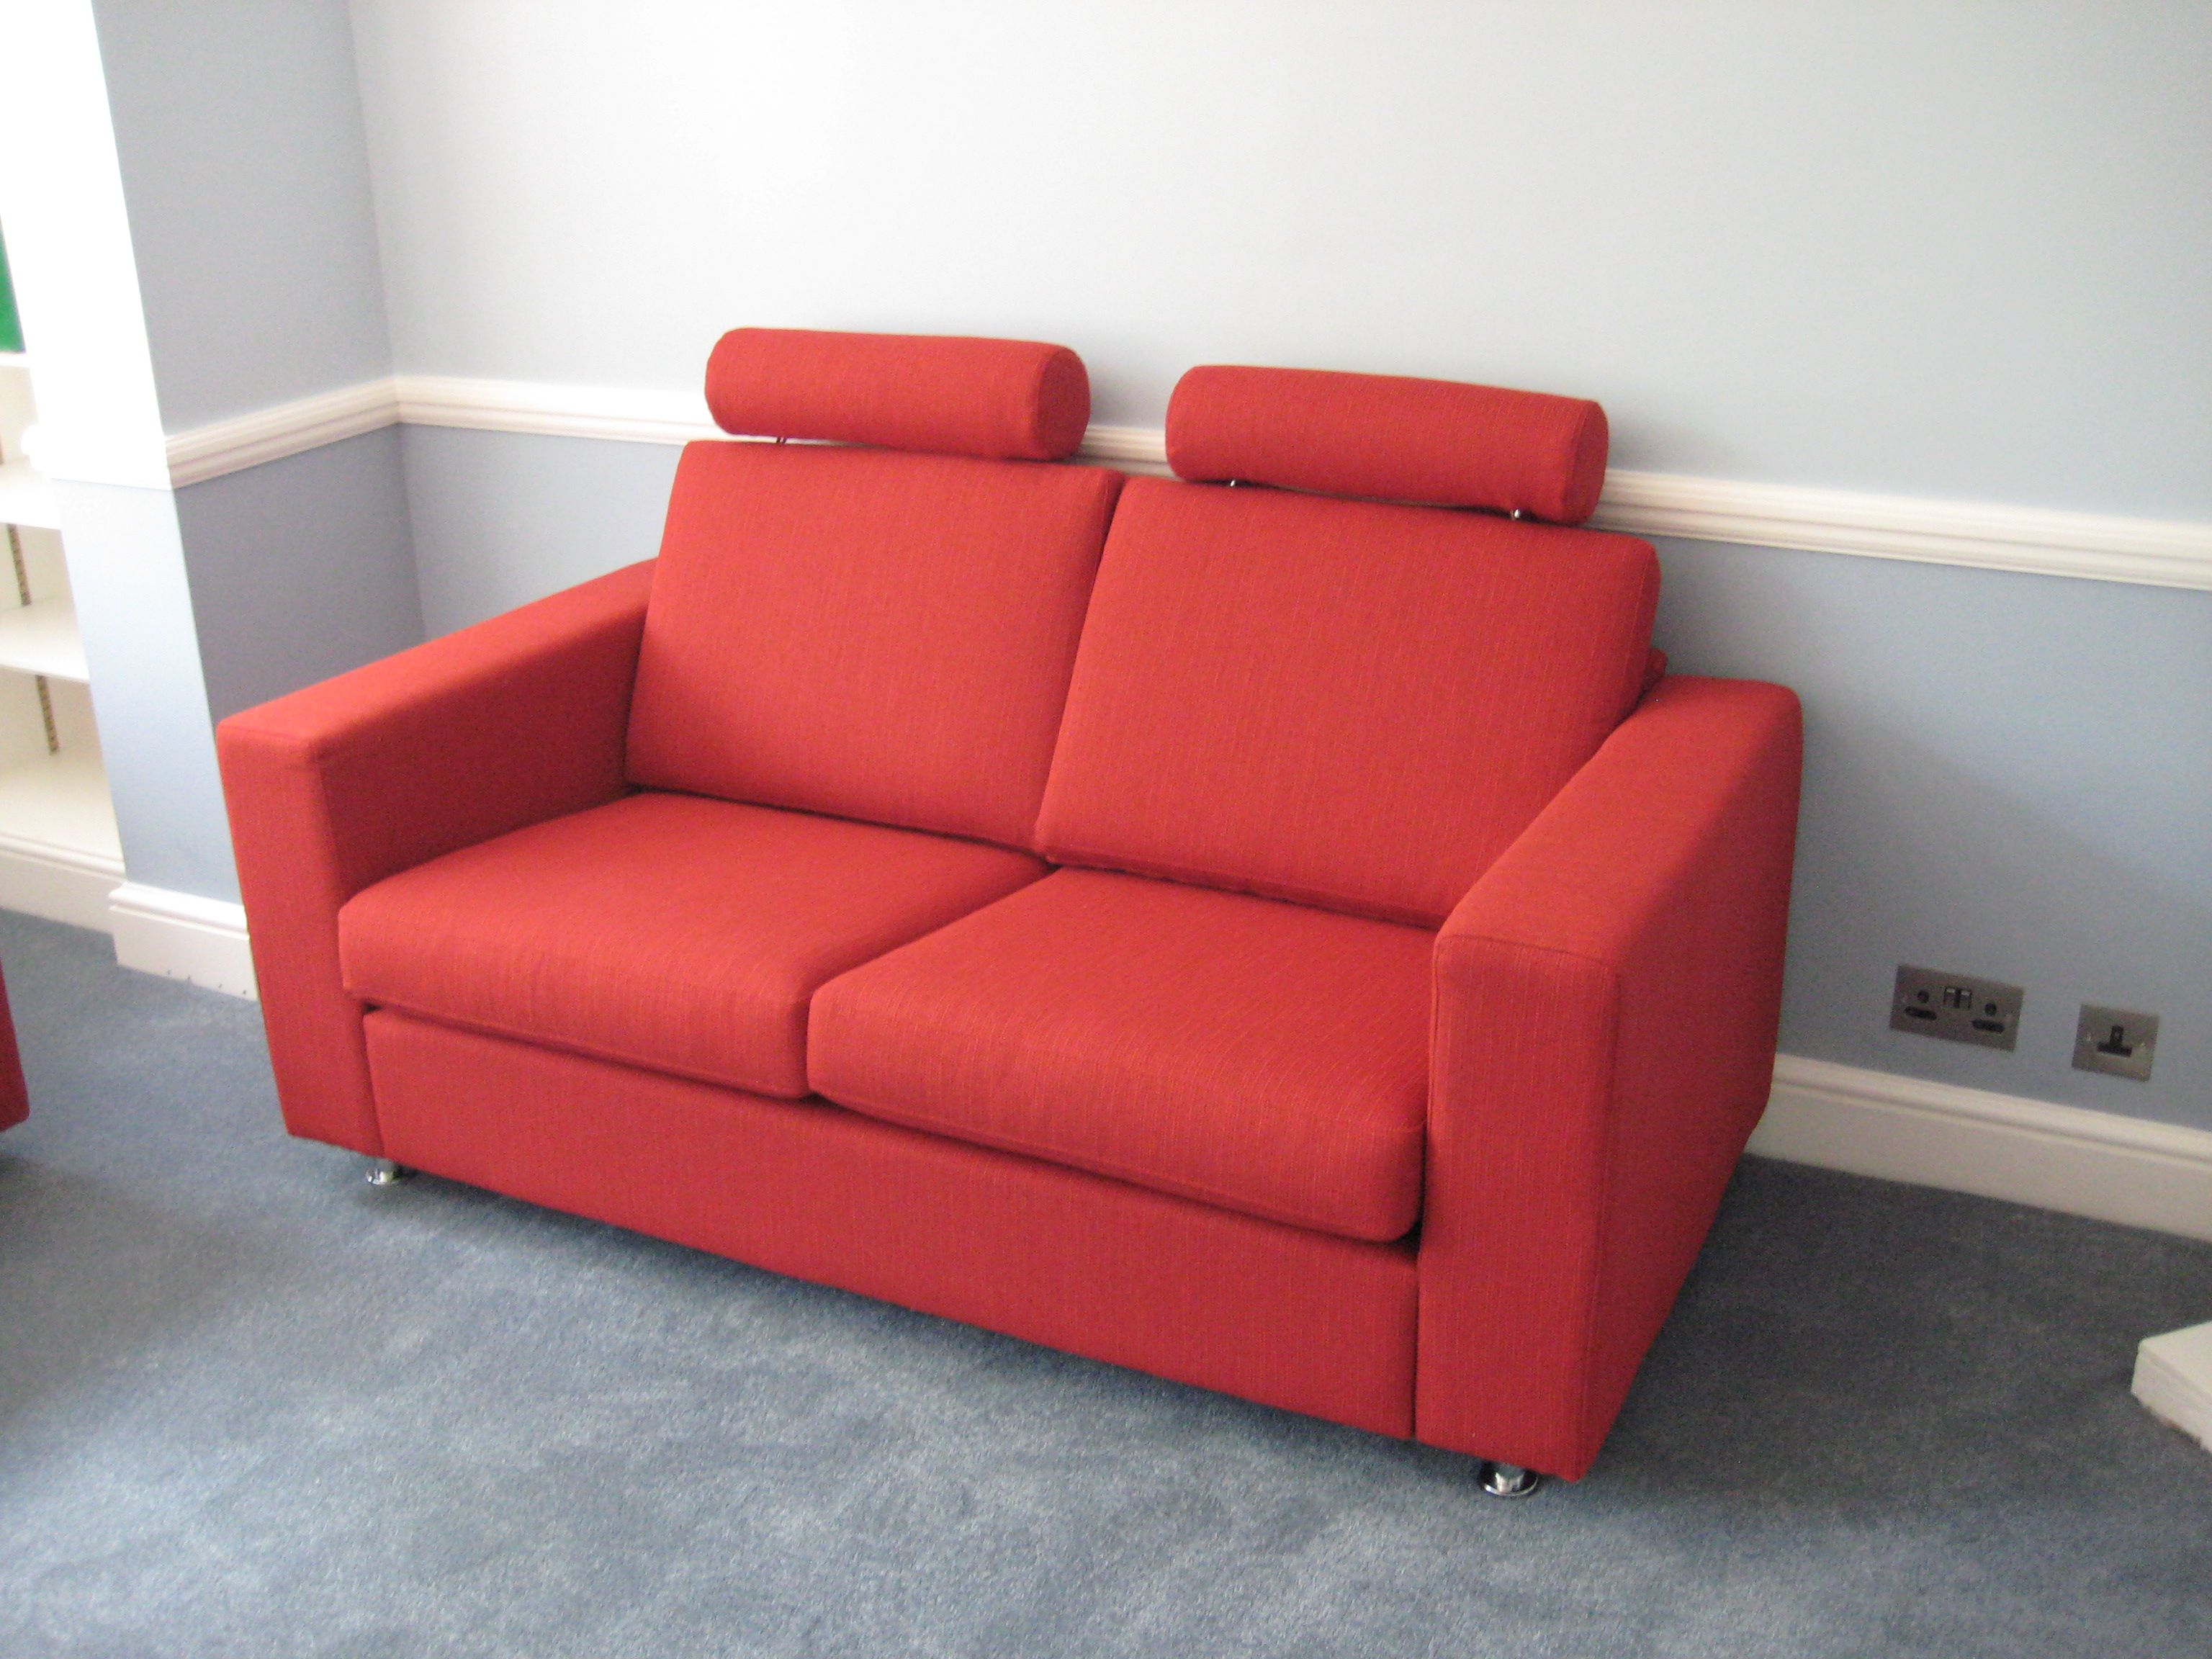 Baby Sofa Chair Malaysia Grey Leather Room Ideas Cute Mini Dolls Dollhouse Furniture Princess